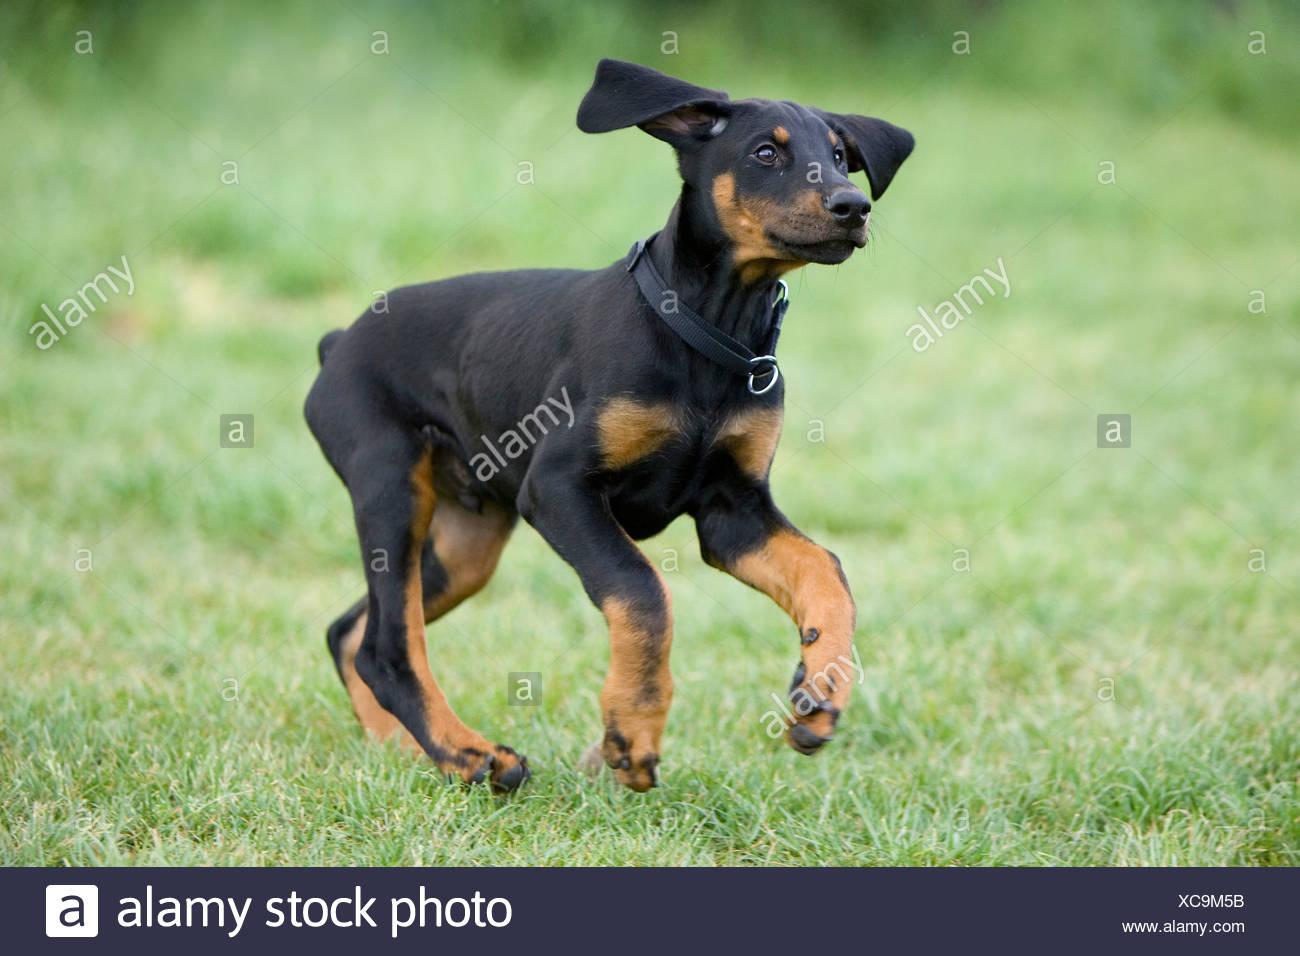 Young Doberman pinscher dog - Stock Image